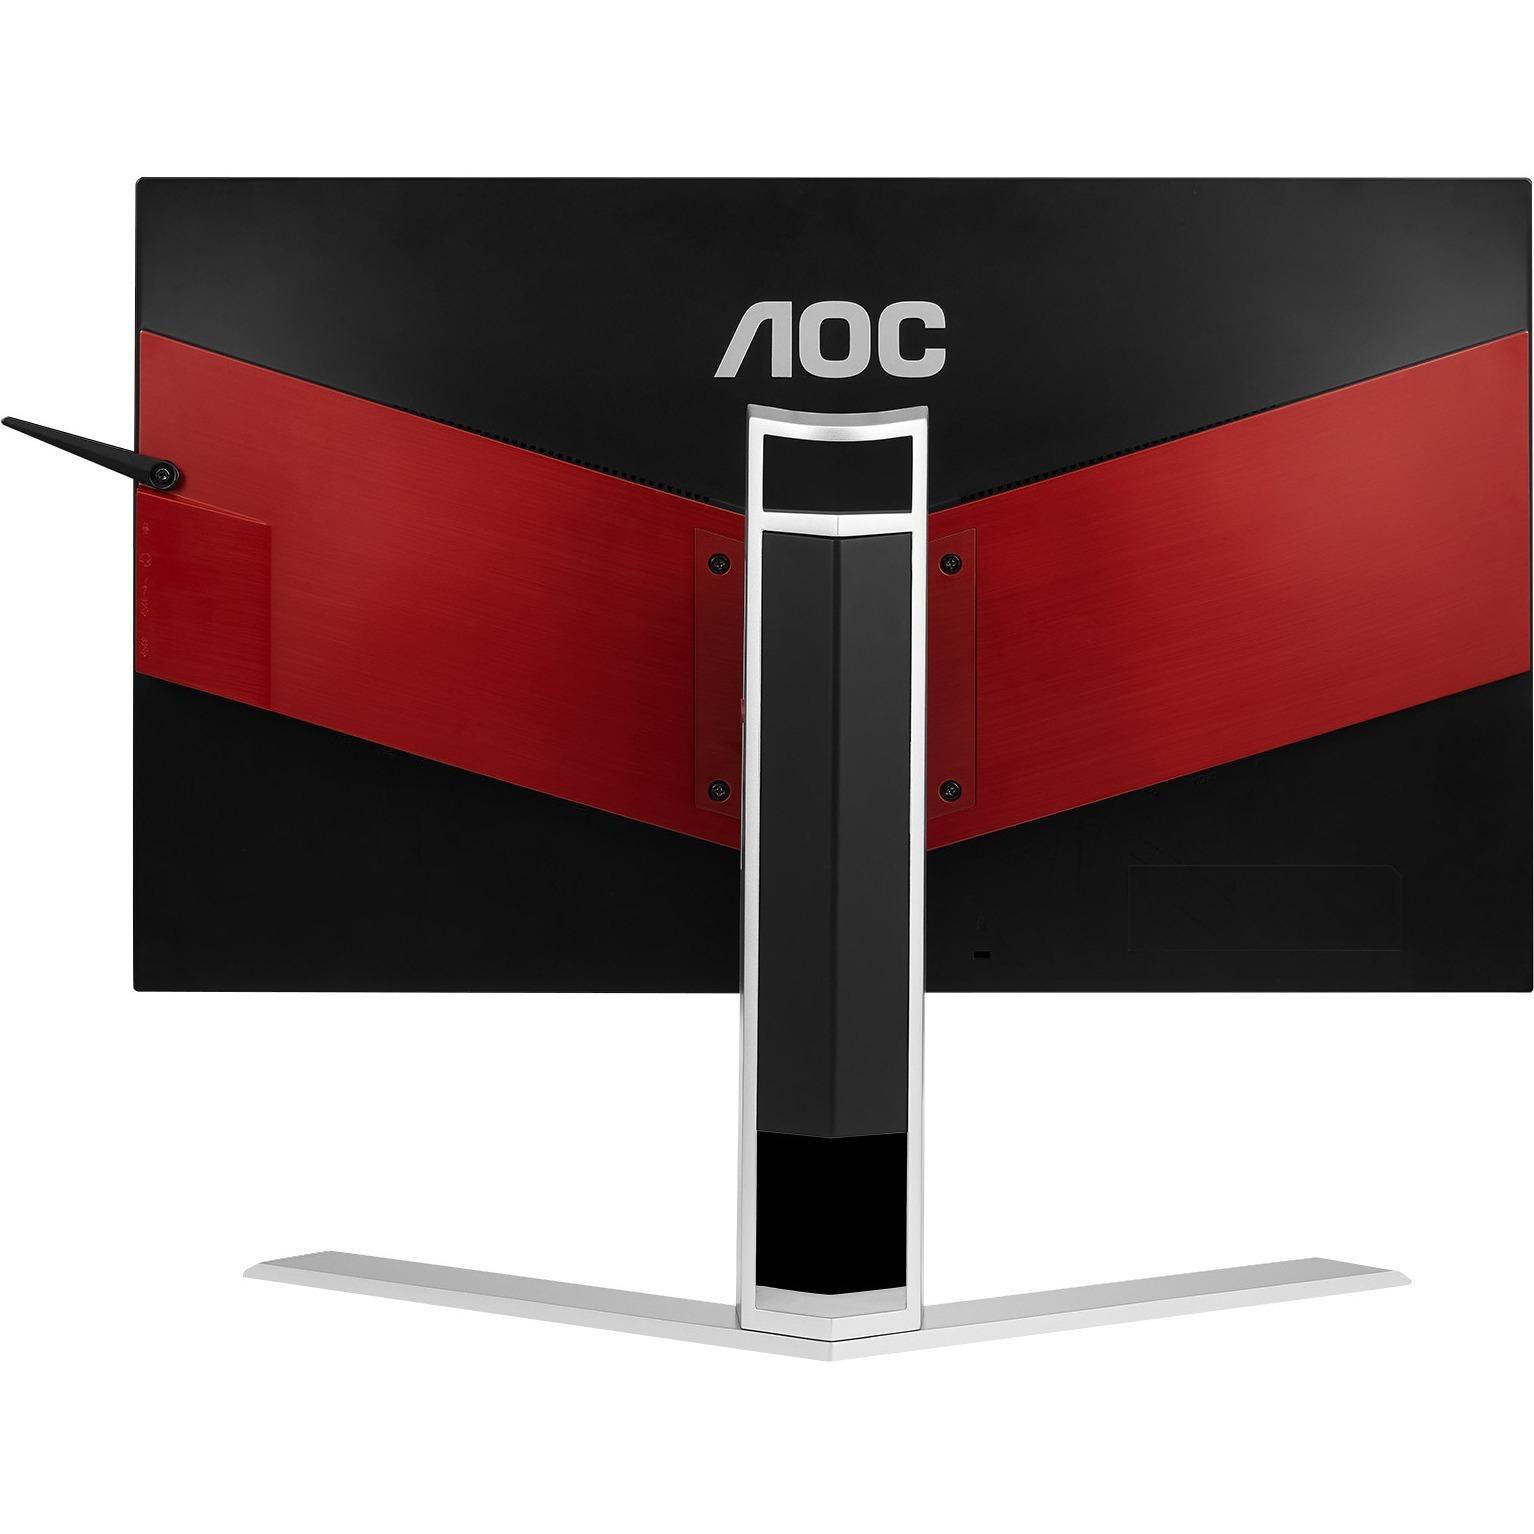 AOC AGON AG271QG  27inch LED Monitor